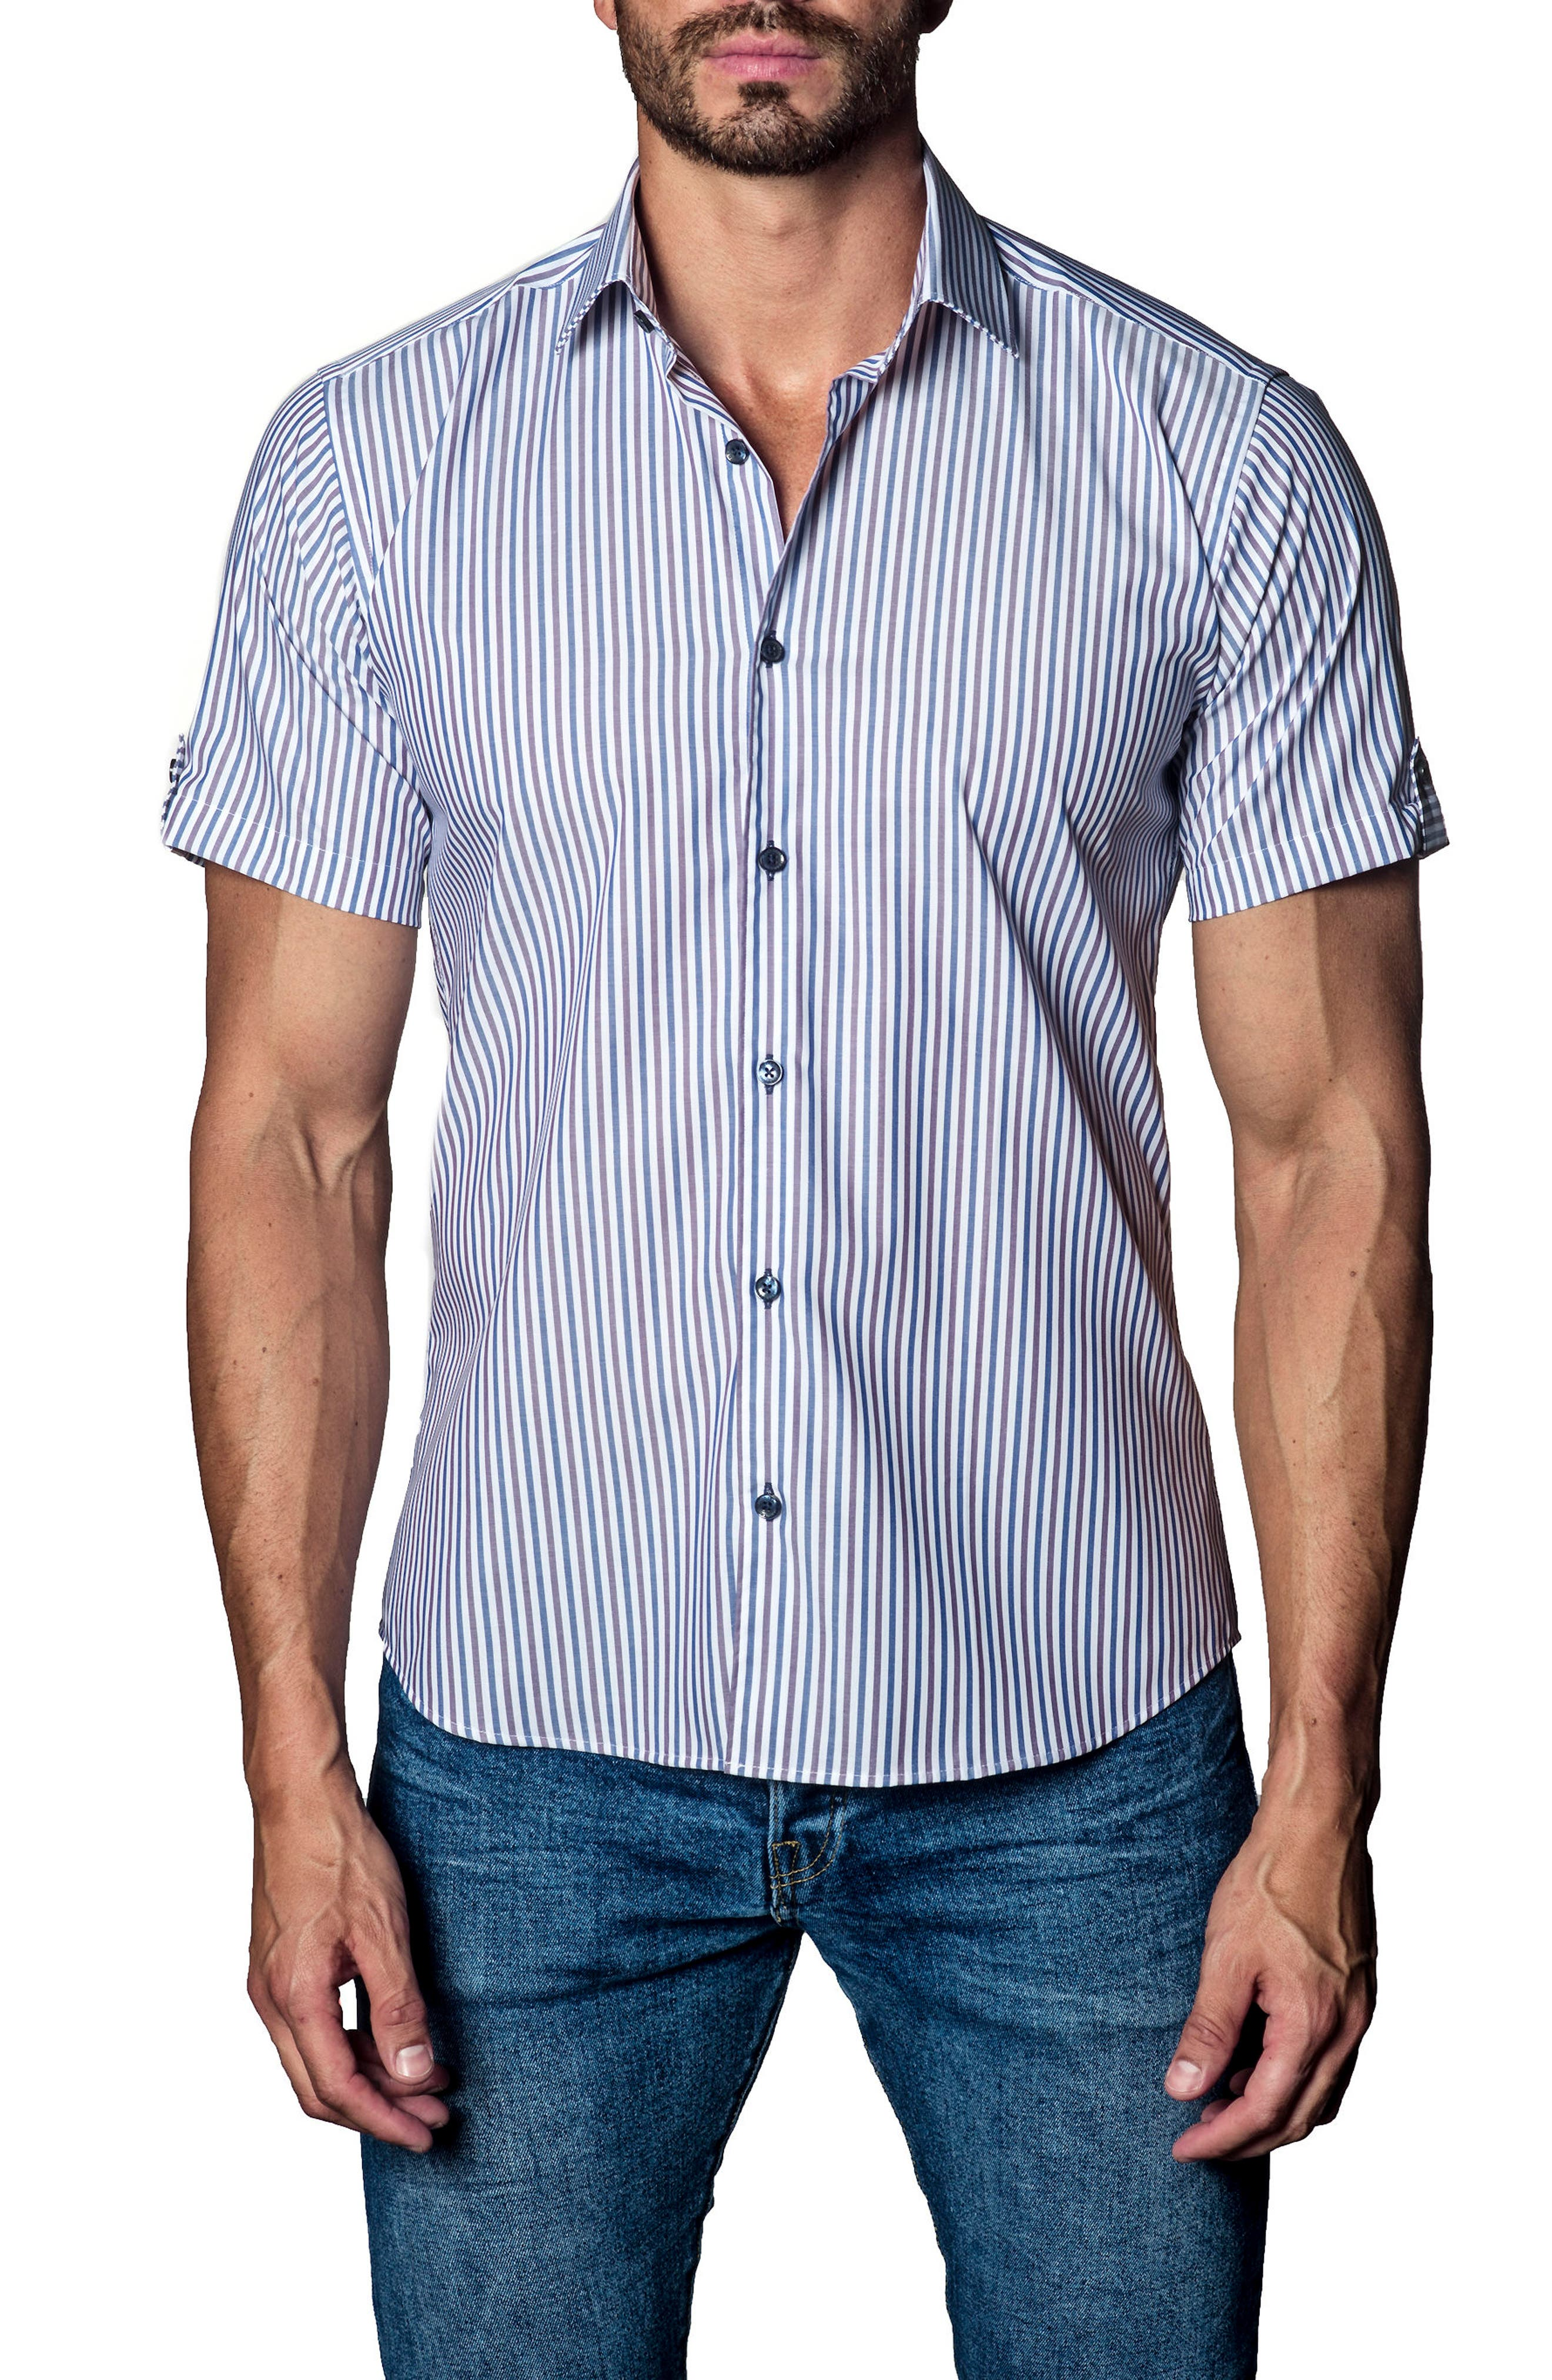 Stripe Sport Shirt,                         Main,                         color, White/ Blue/ Brown Stripe